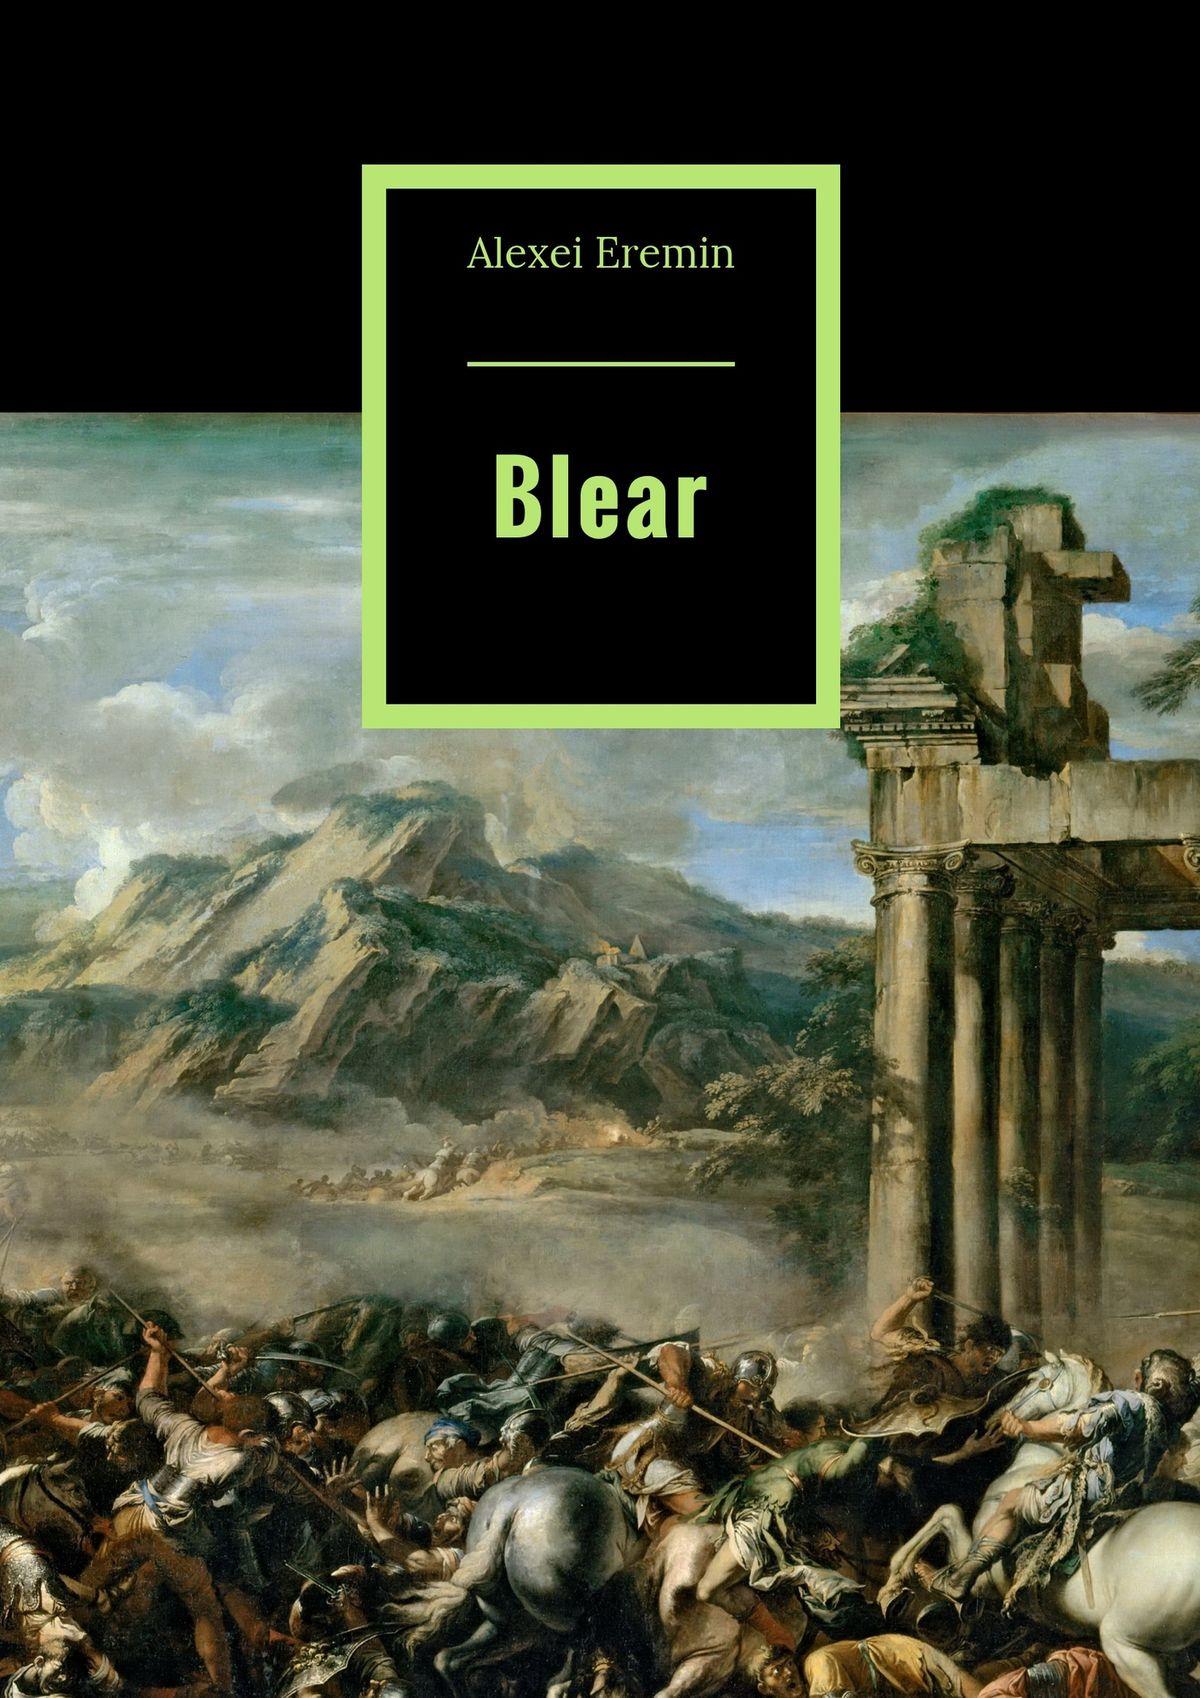 Blear